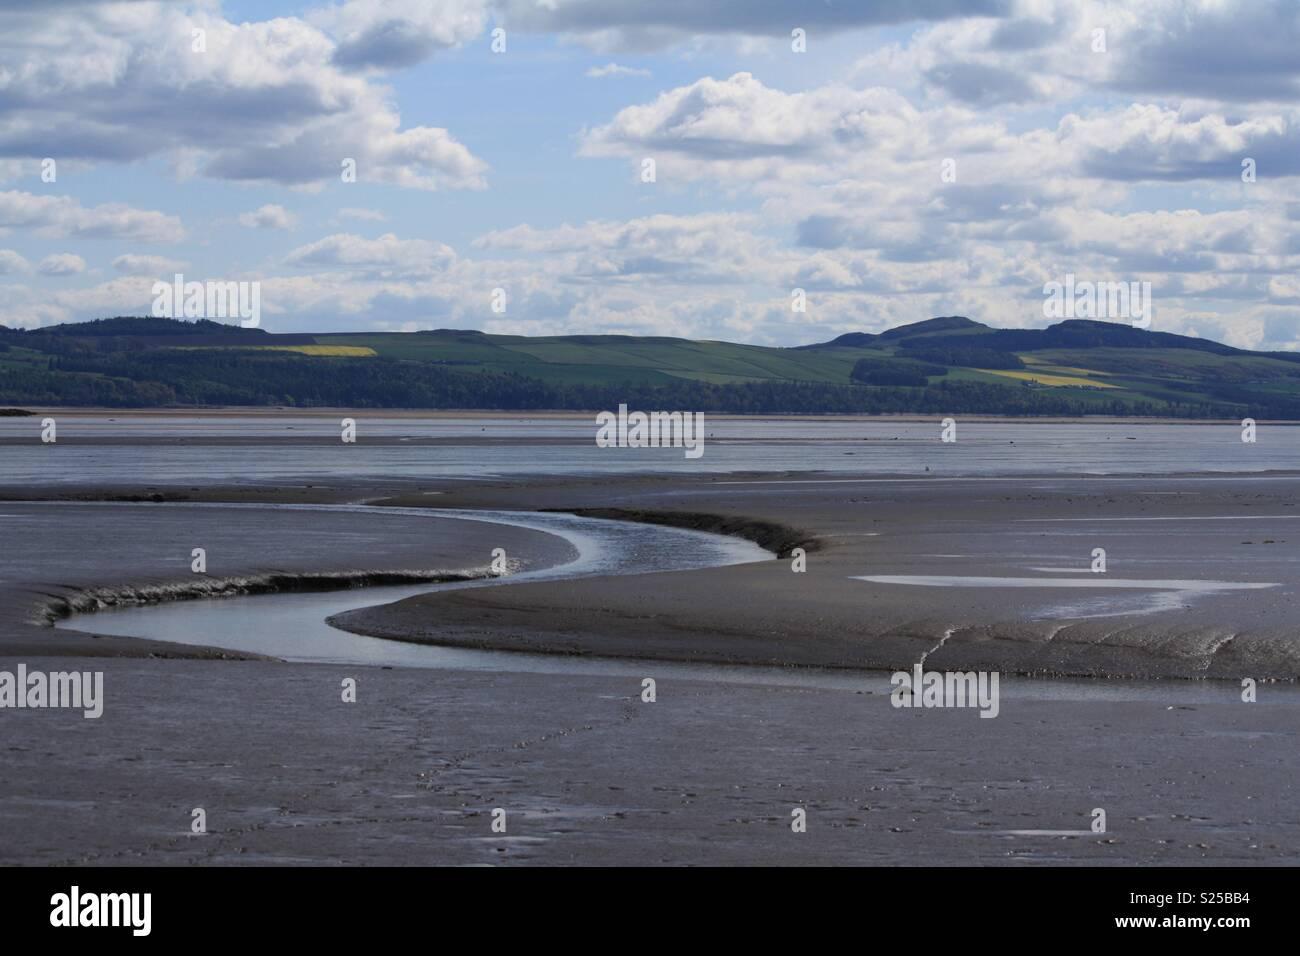 Tay estuary tide out - Stock Image